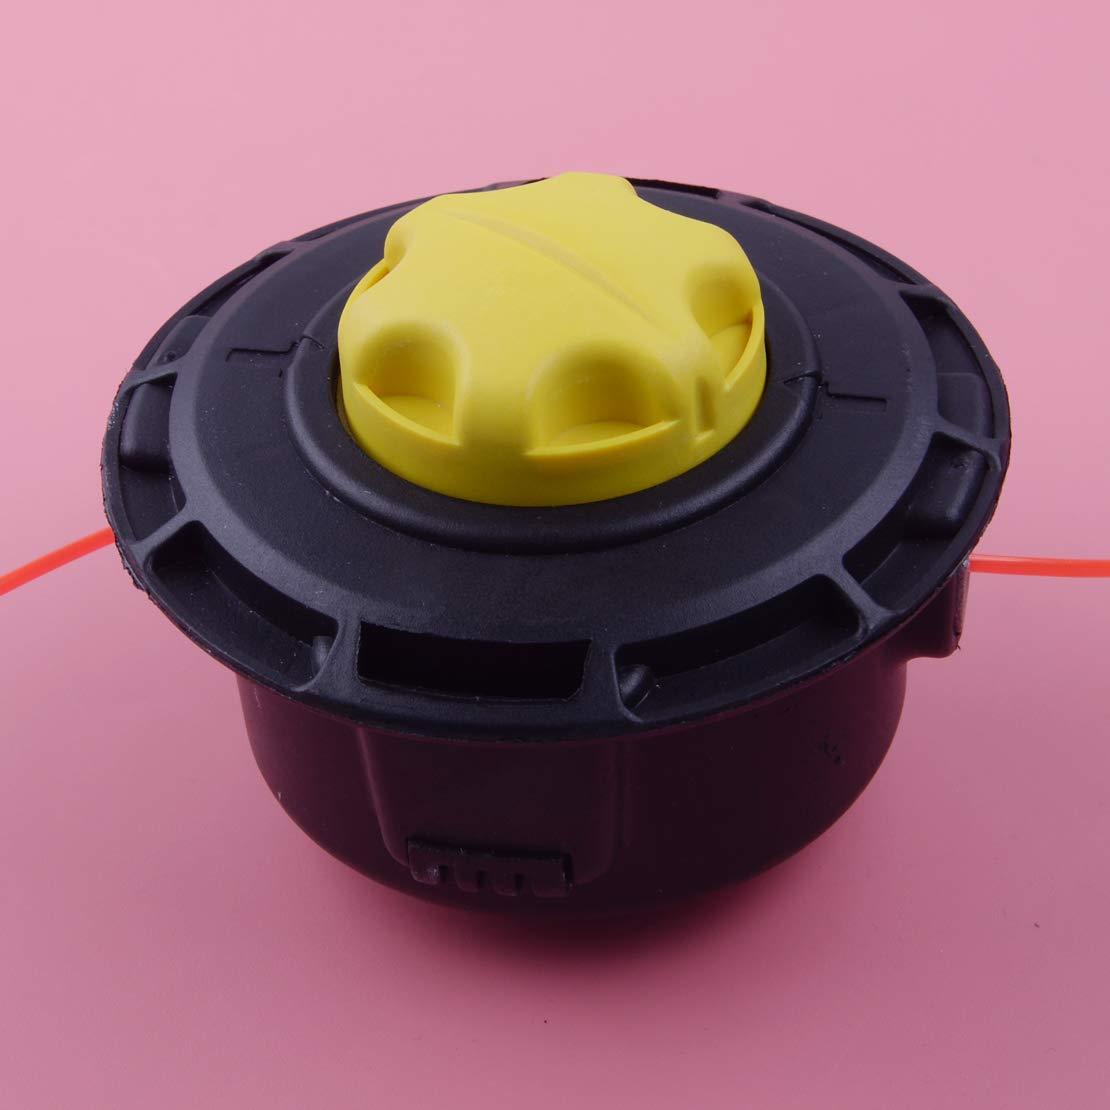 Ryobi Strimmer Mini Bump Feed 2 Line Head Fit for Toro Ryobi Reel